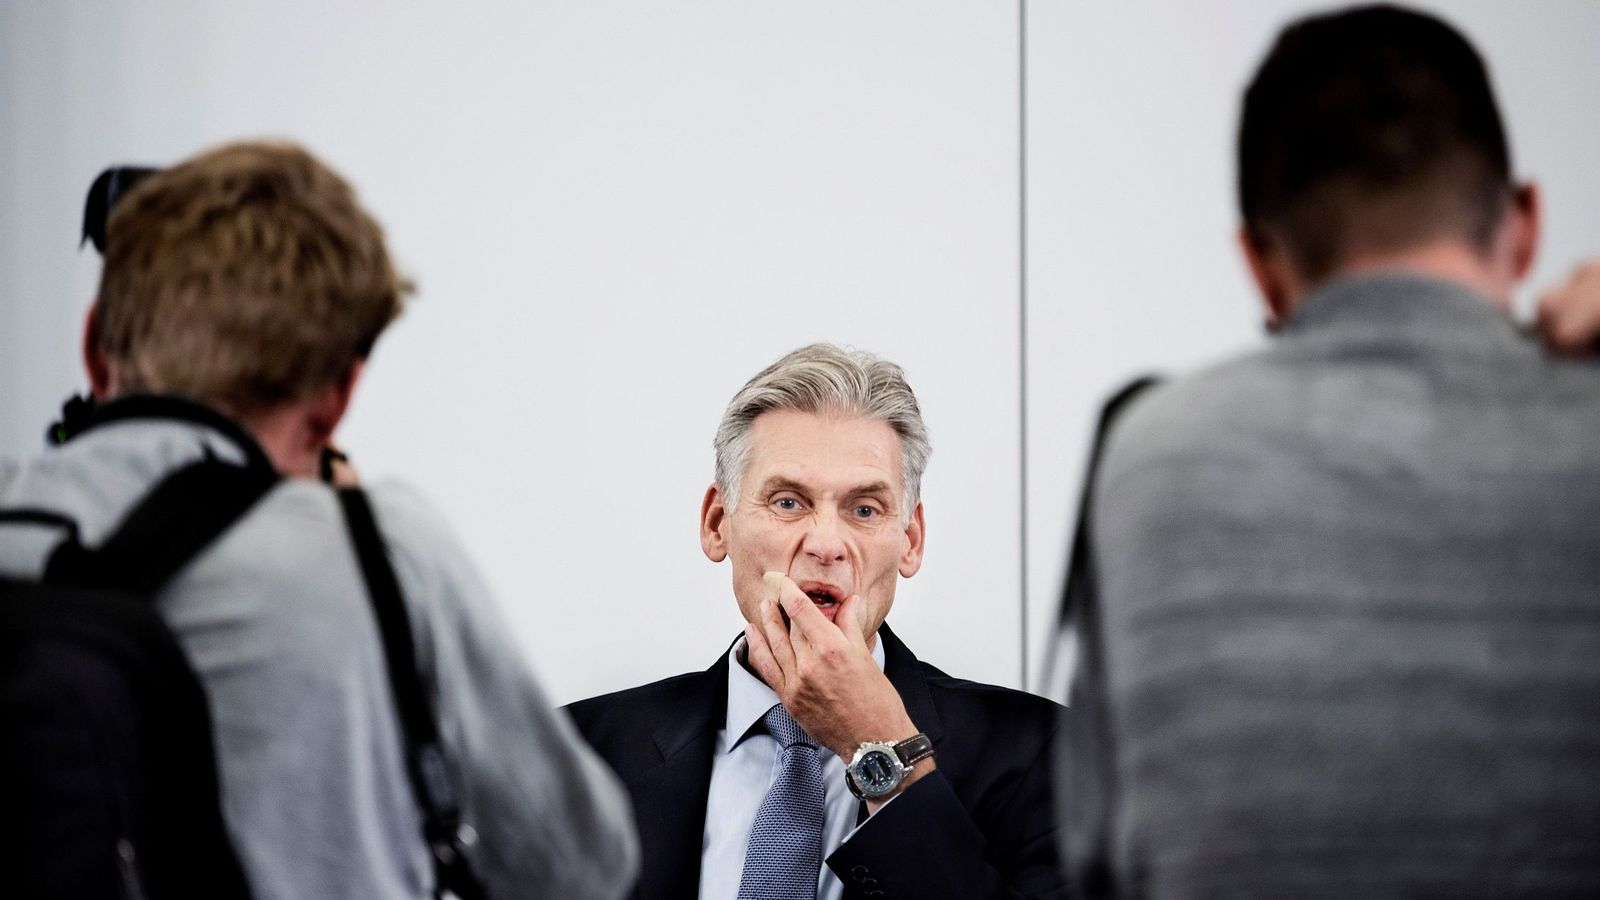 Foto: El ex primer ejecutivo de Danske Bank, Thomas F. Borgen. (EFE)